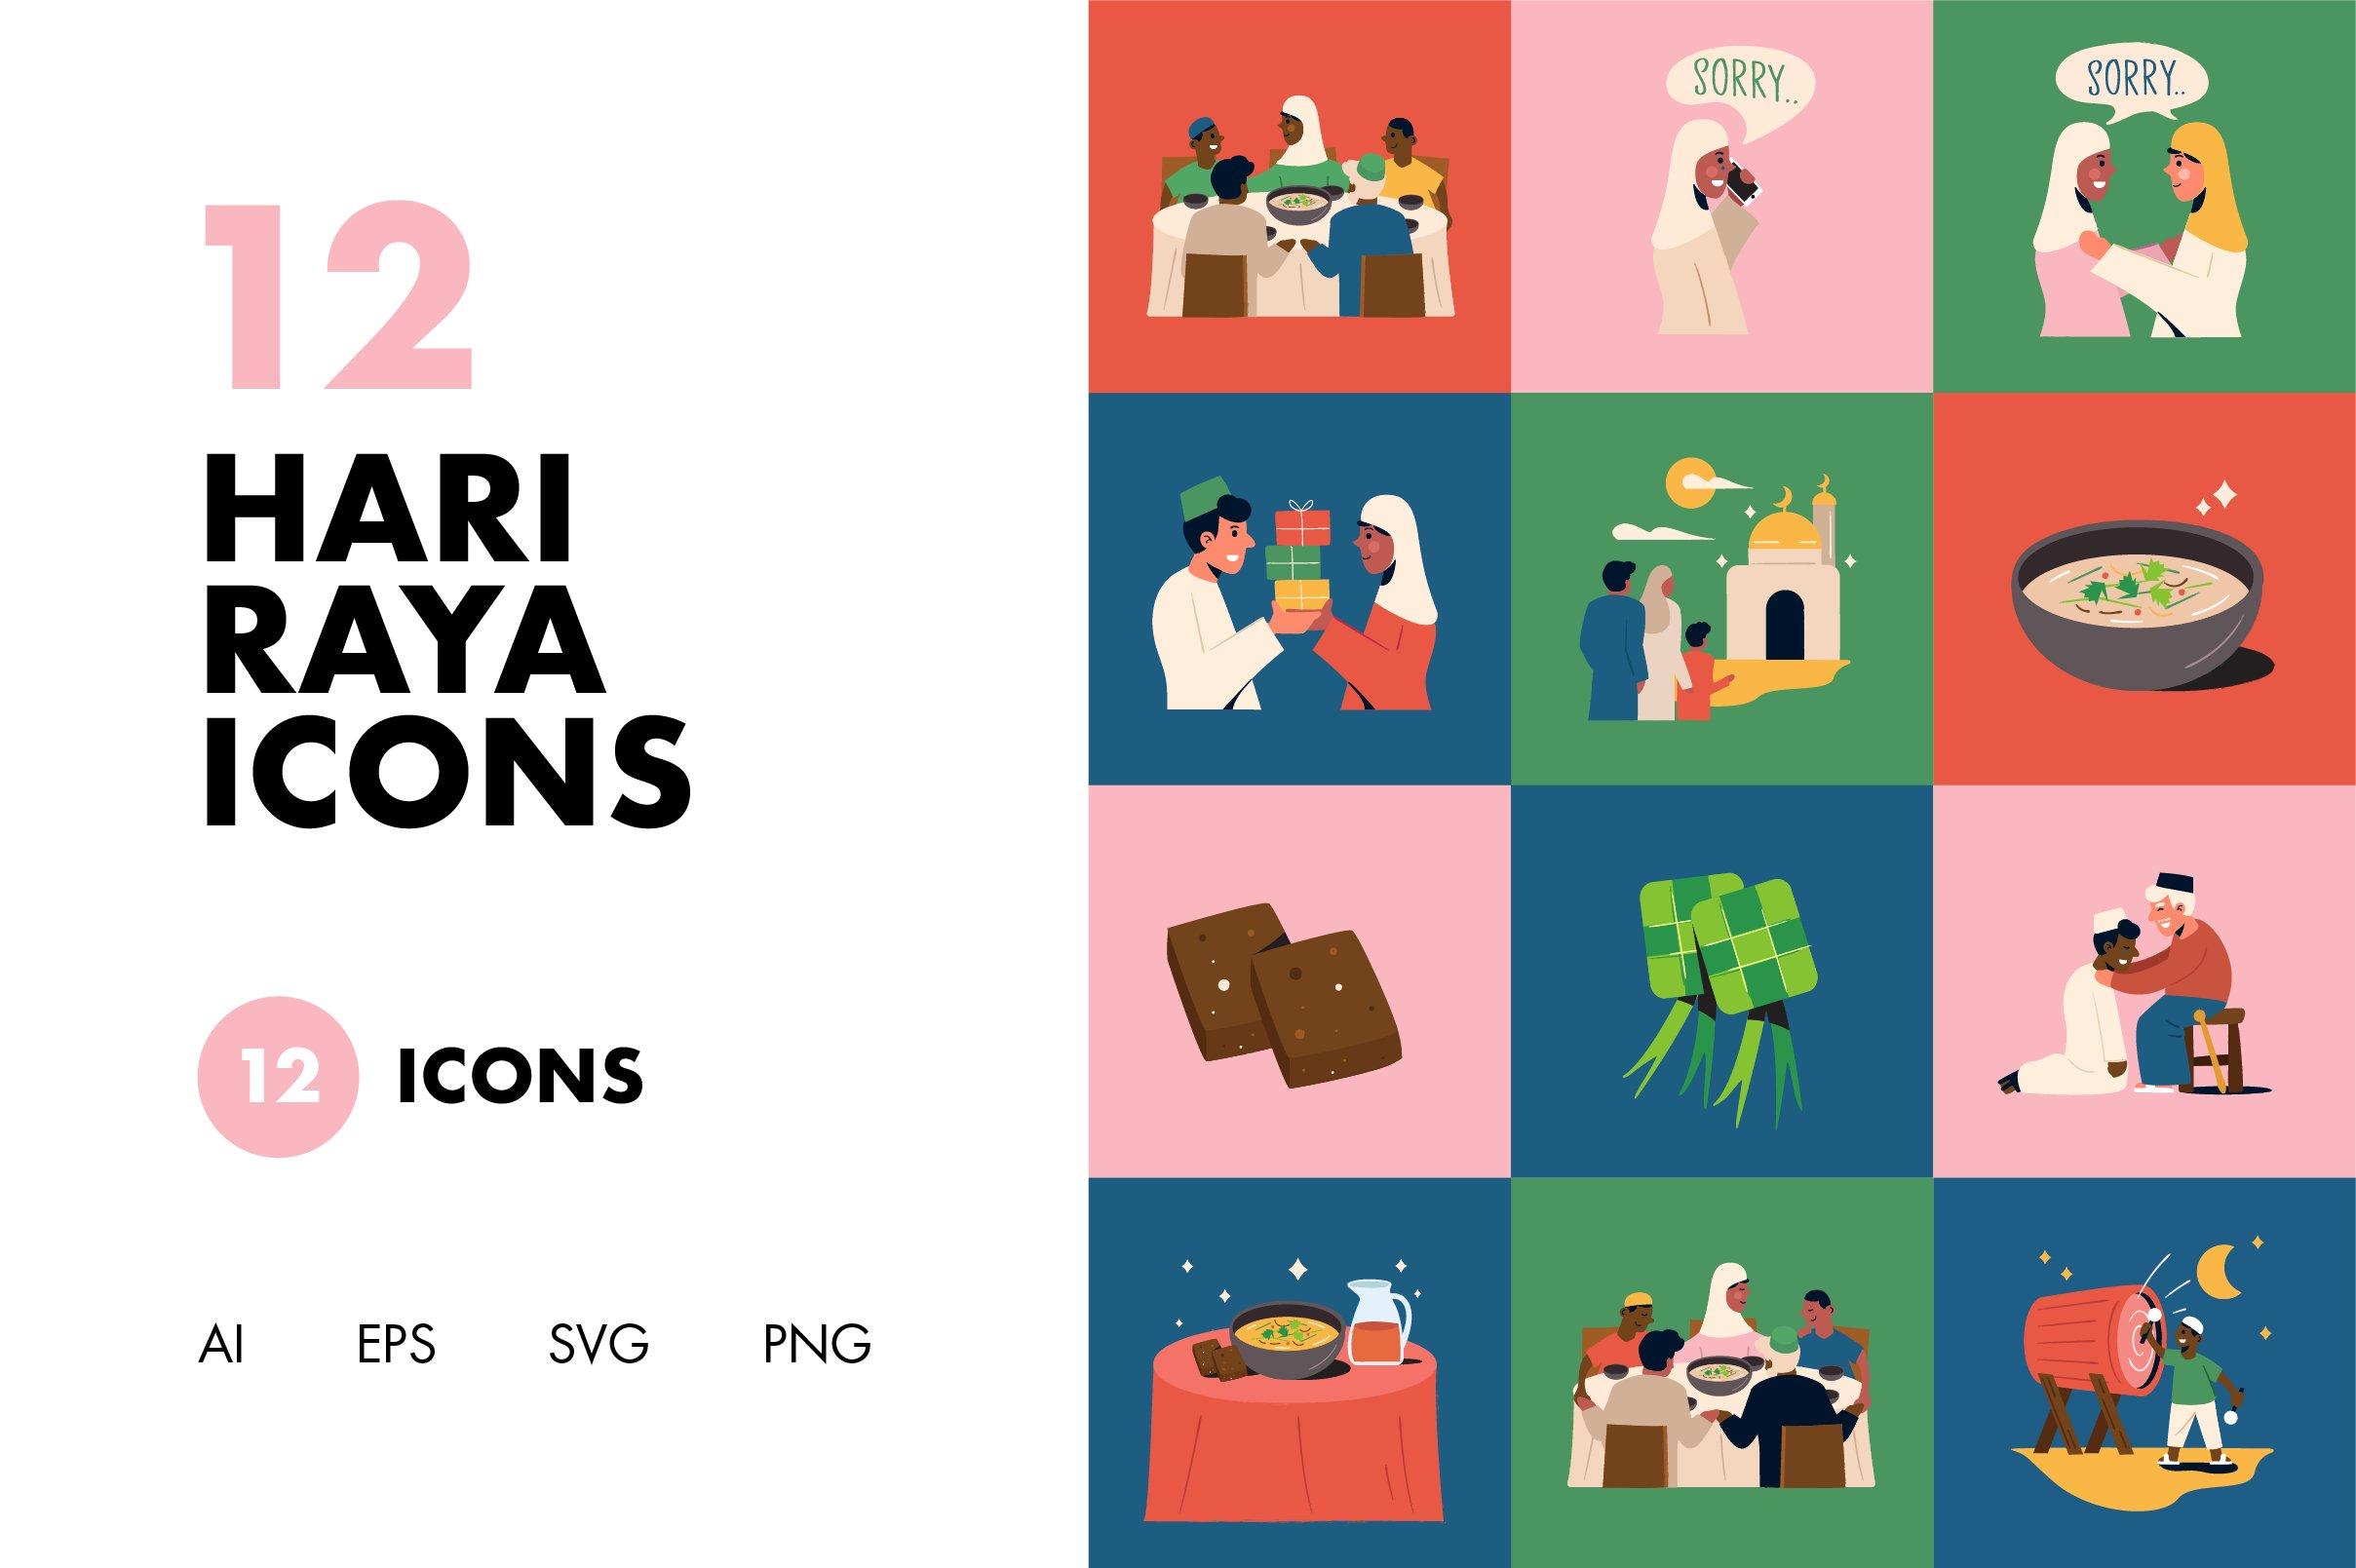 12 Hari Raya Icons Pre Designed Photoshop Graphics Creative Market